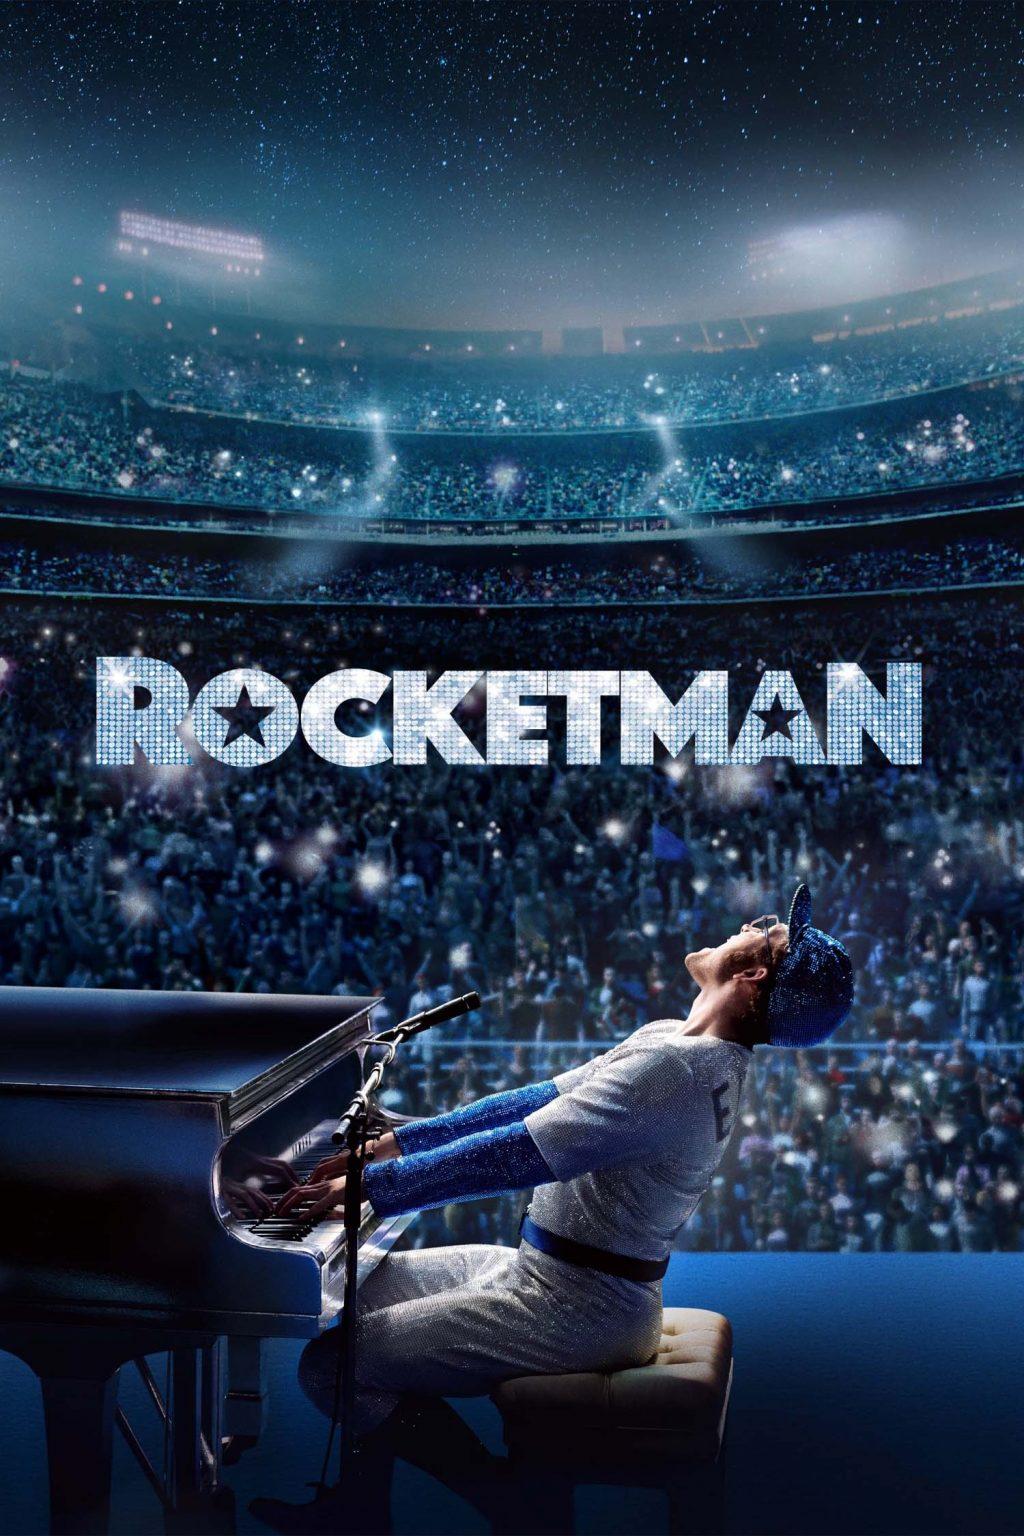 phim chiếu rạp rocketman